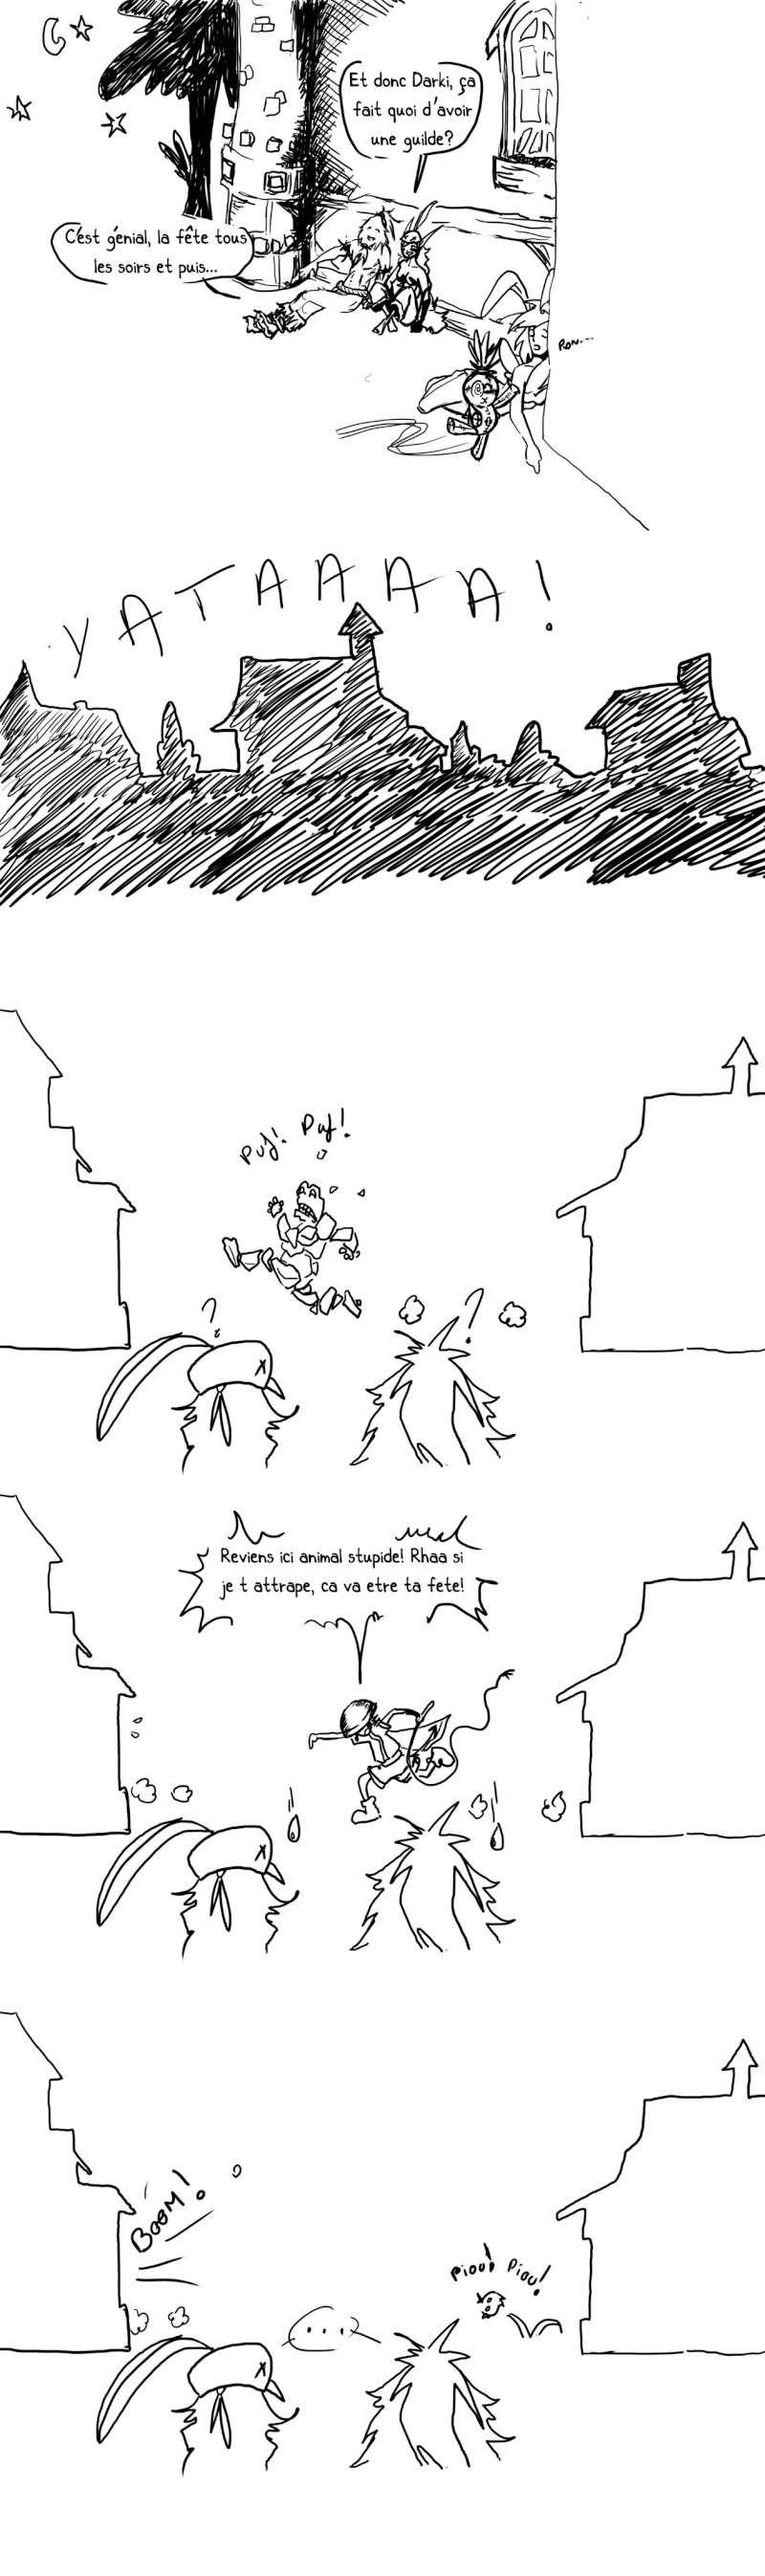 seik et ekis, les aventures ILLUSTREES - Page 4 Strip119